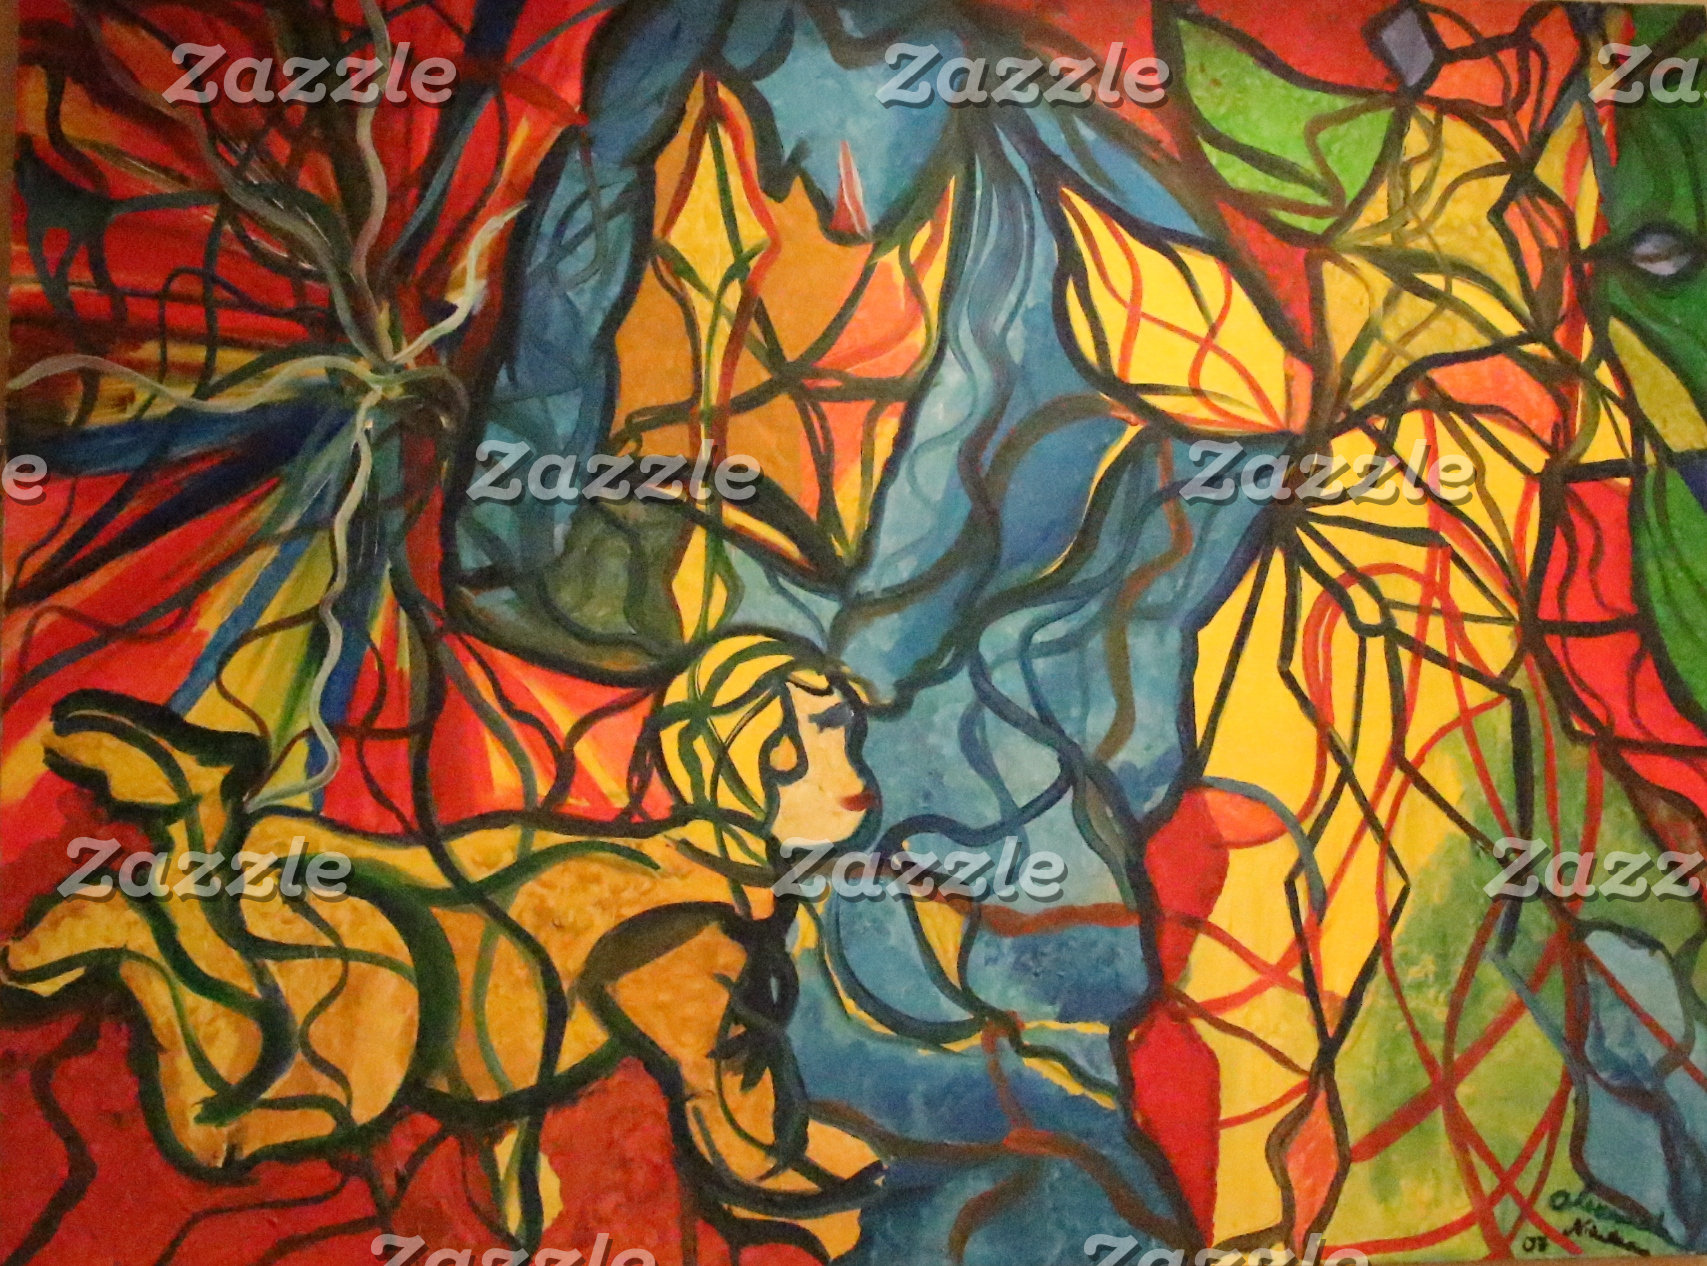 ArtAndra Art Collection